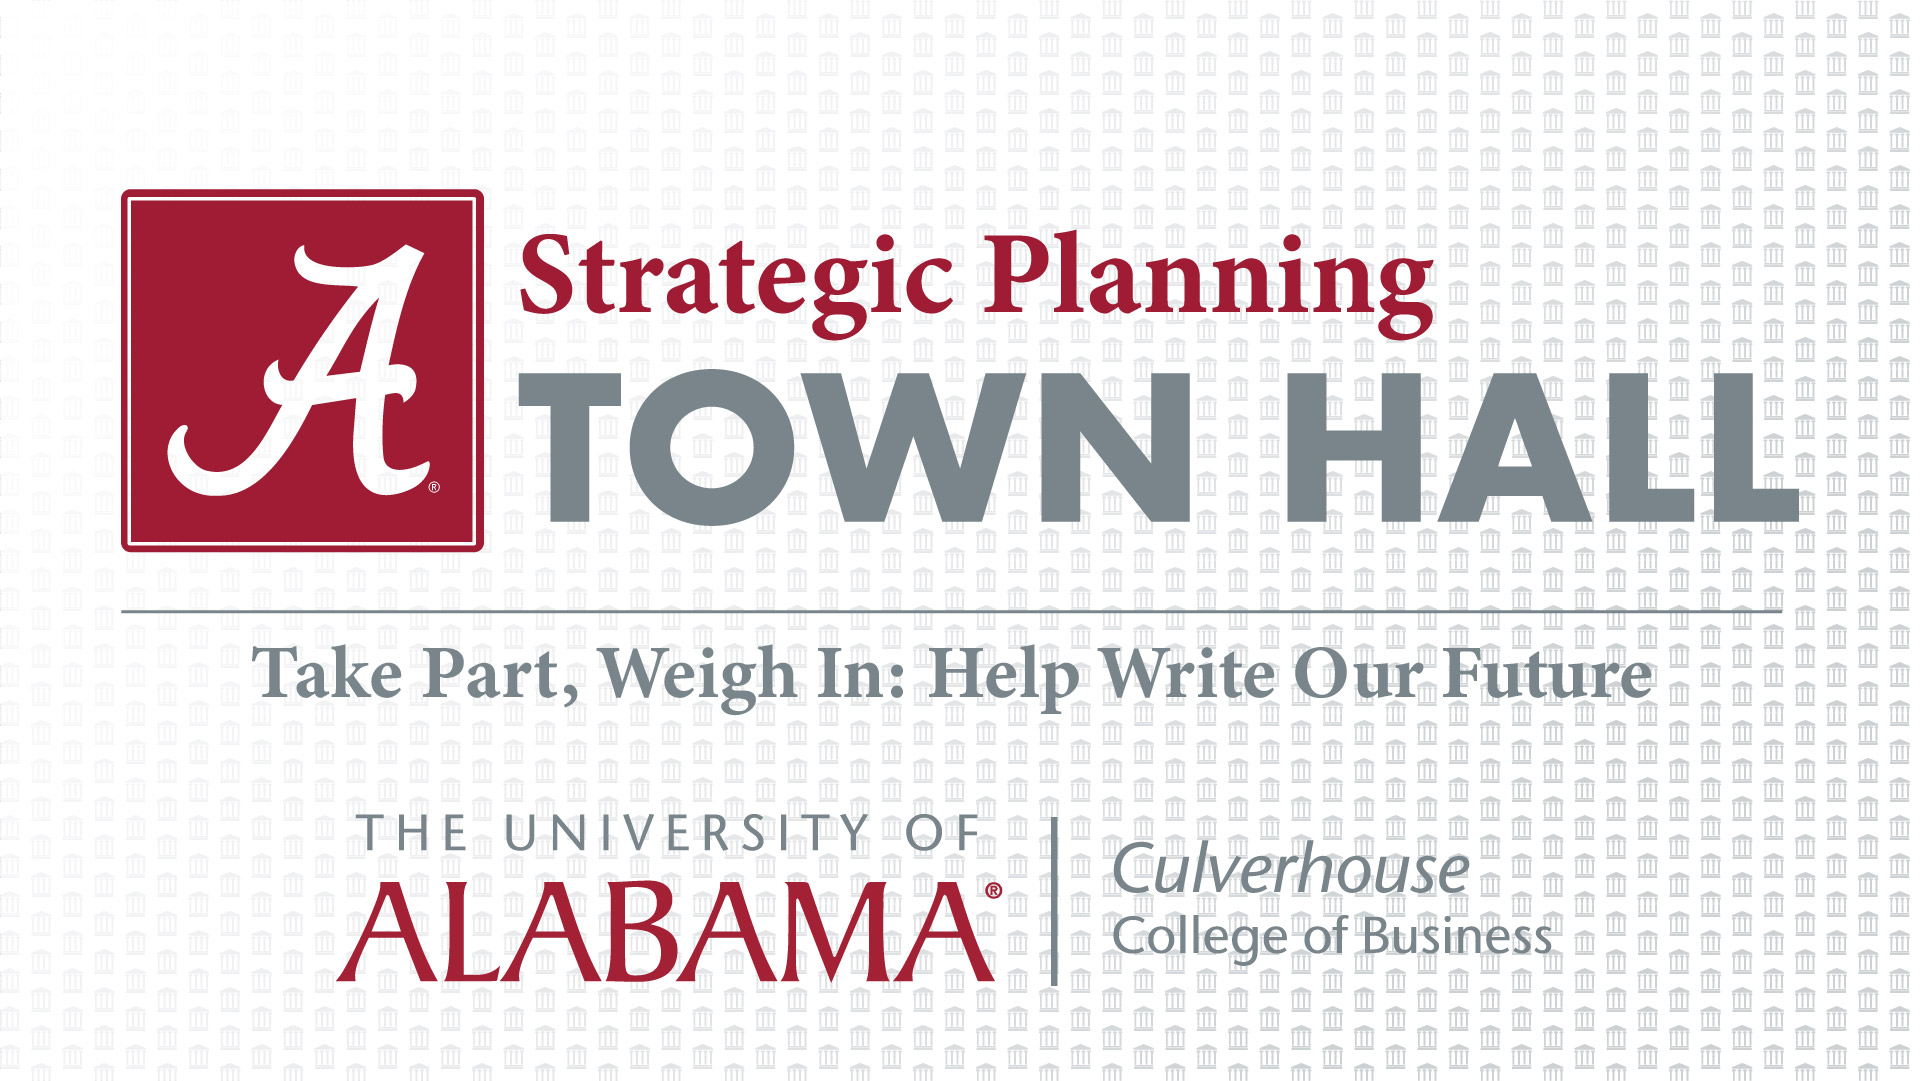 Strategic Planning Town Hall header